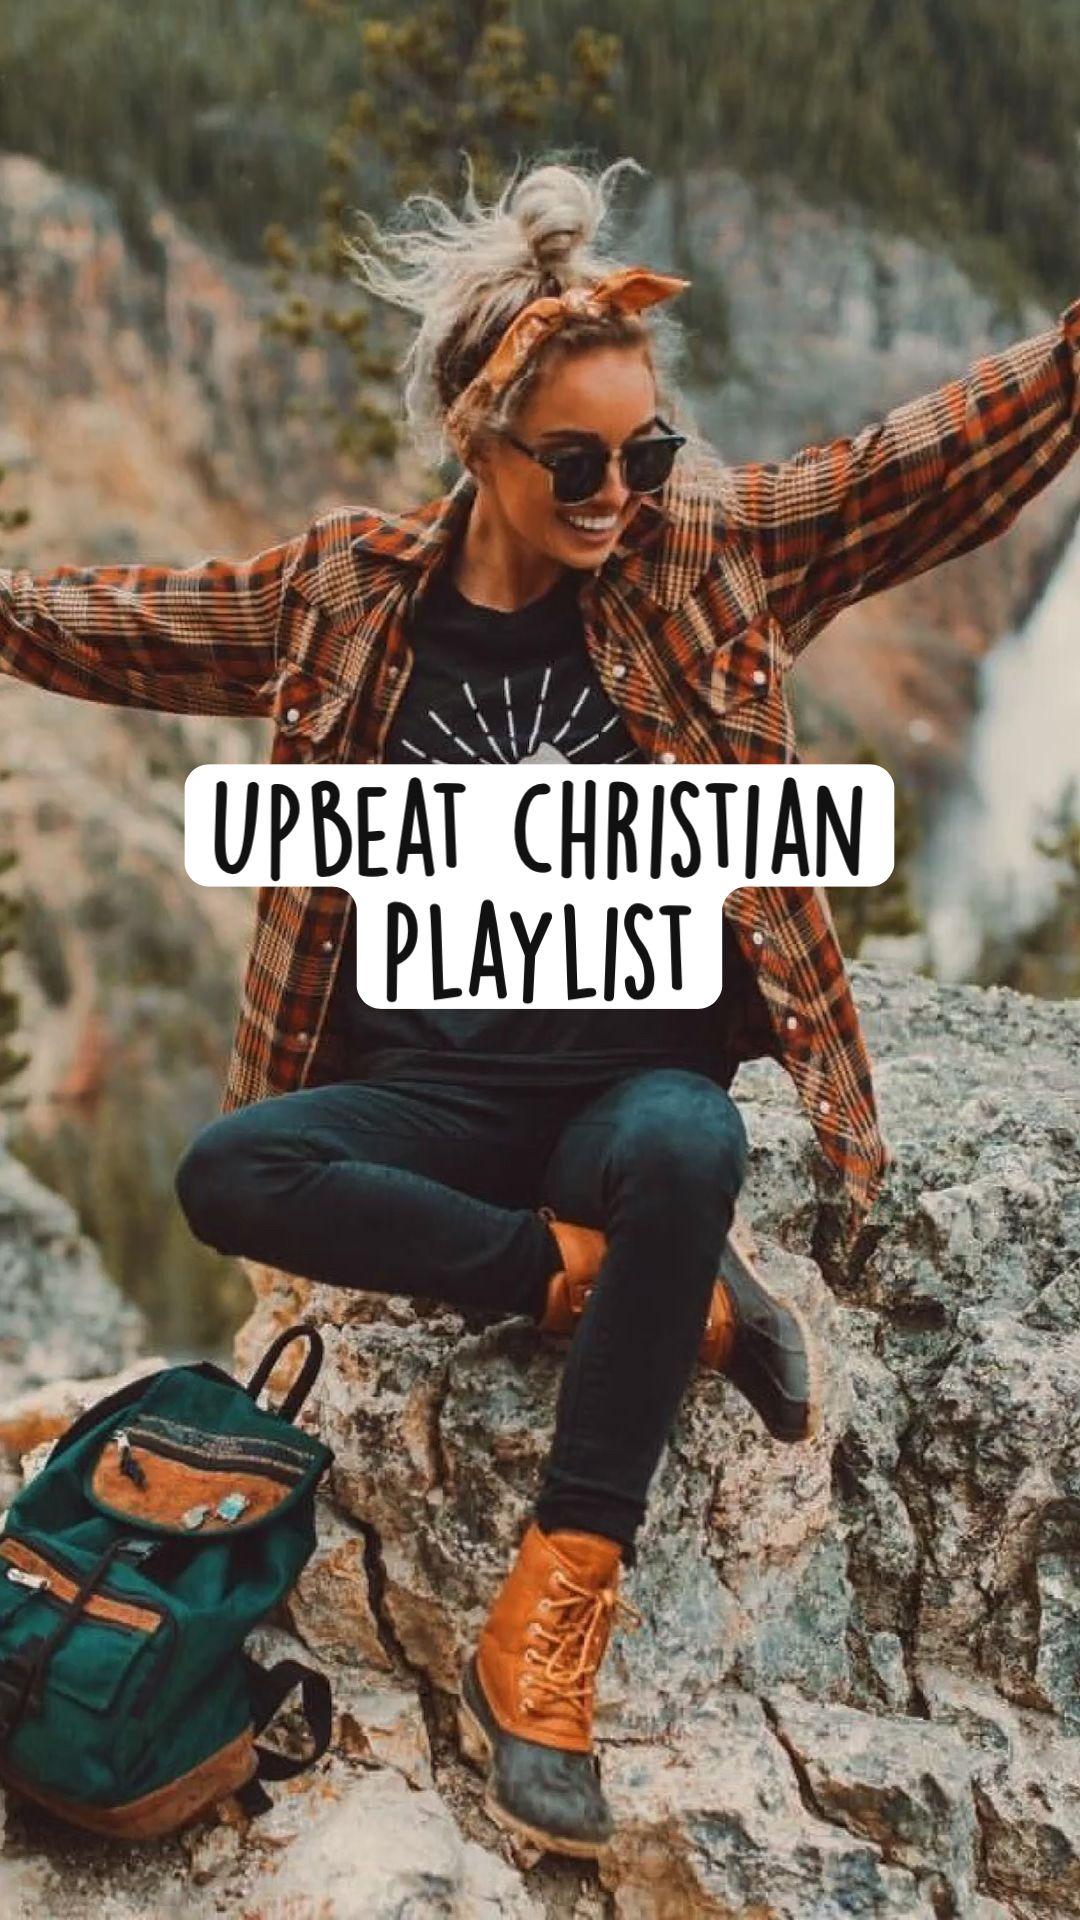 Upbeat Christian Playlist